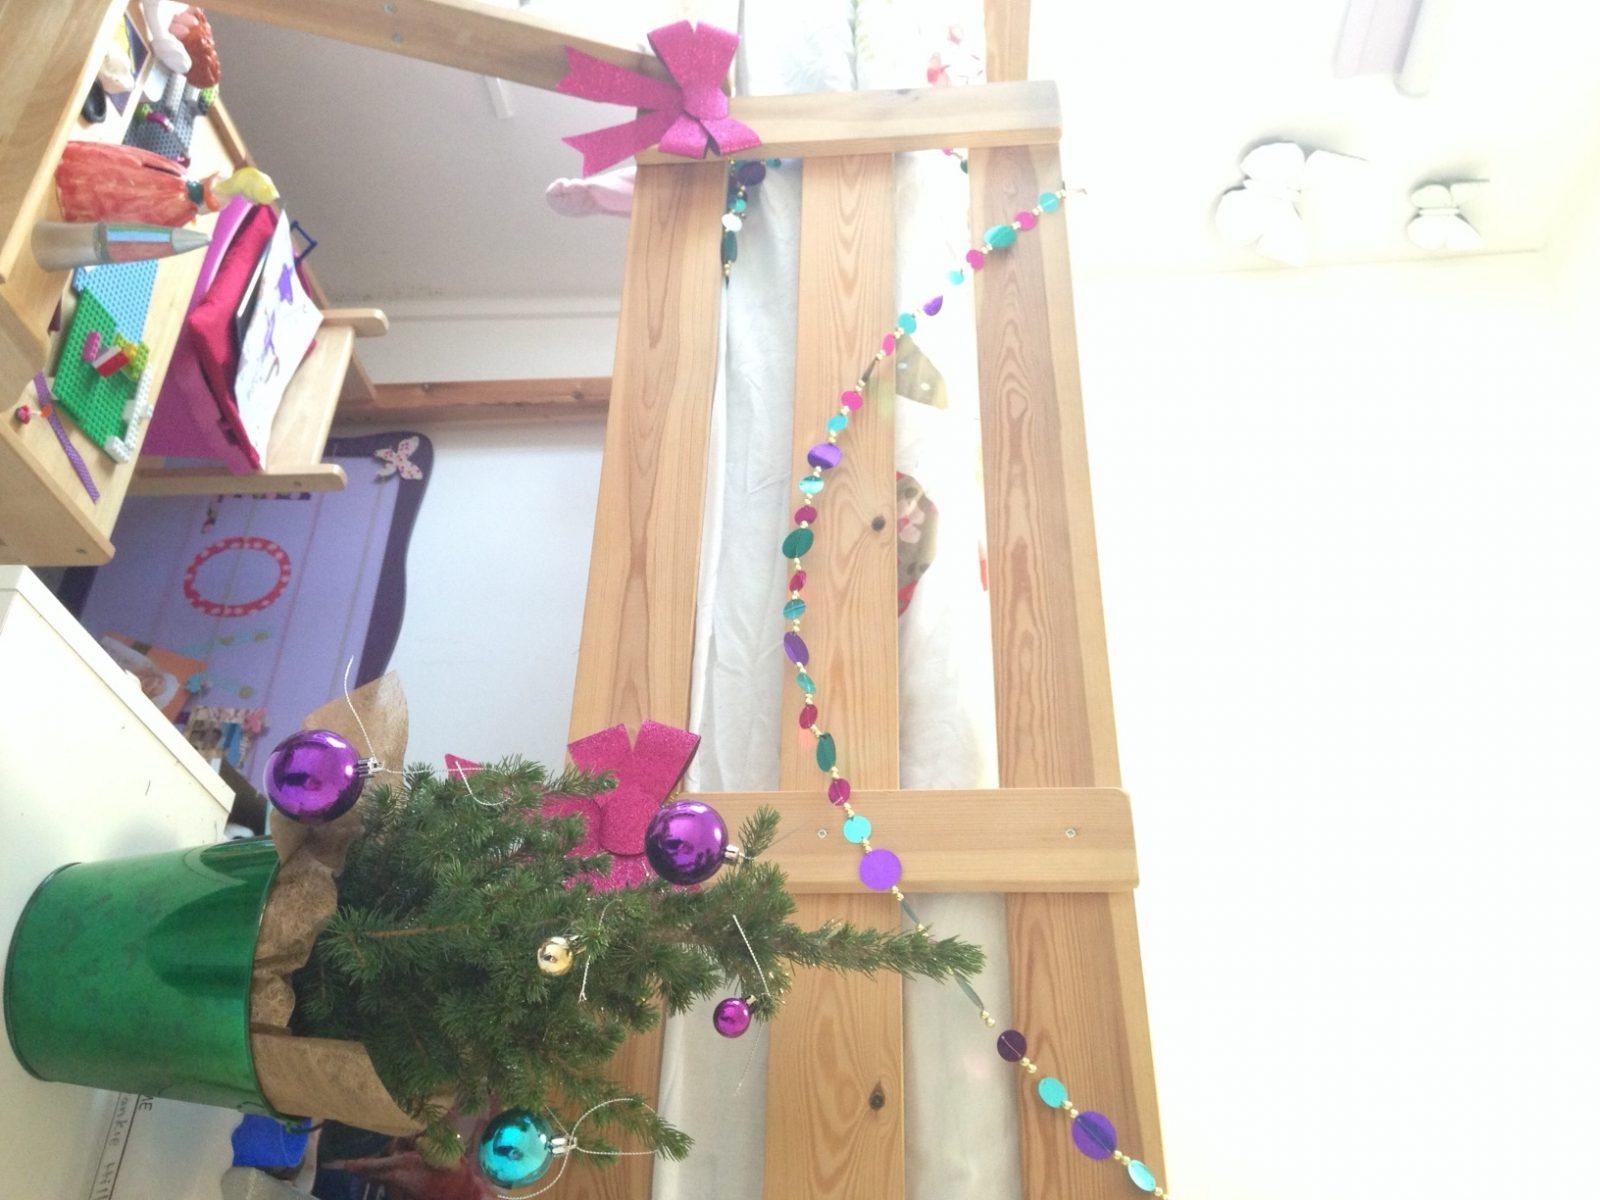 A Poundland Christmas Surprise